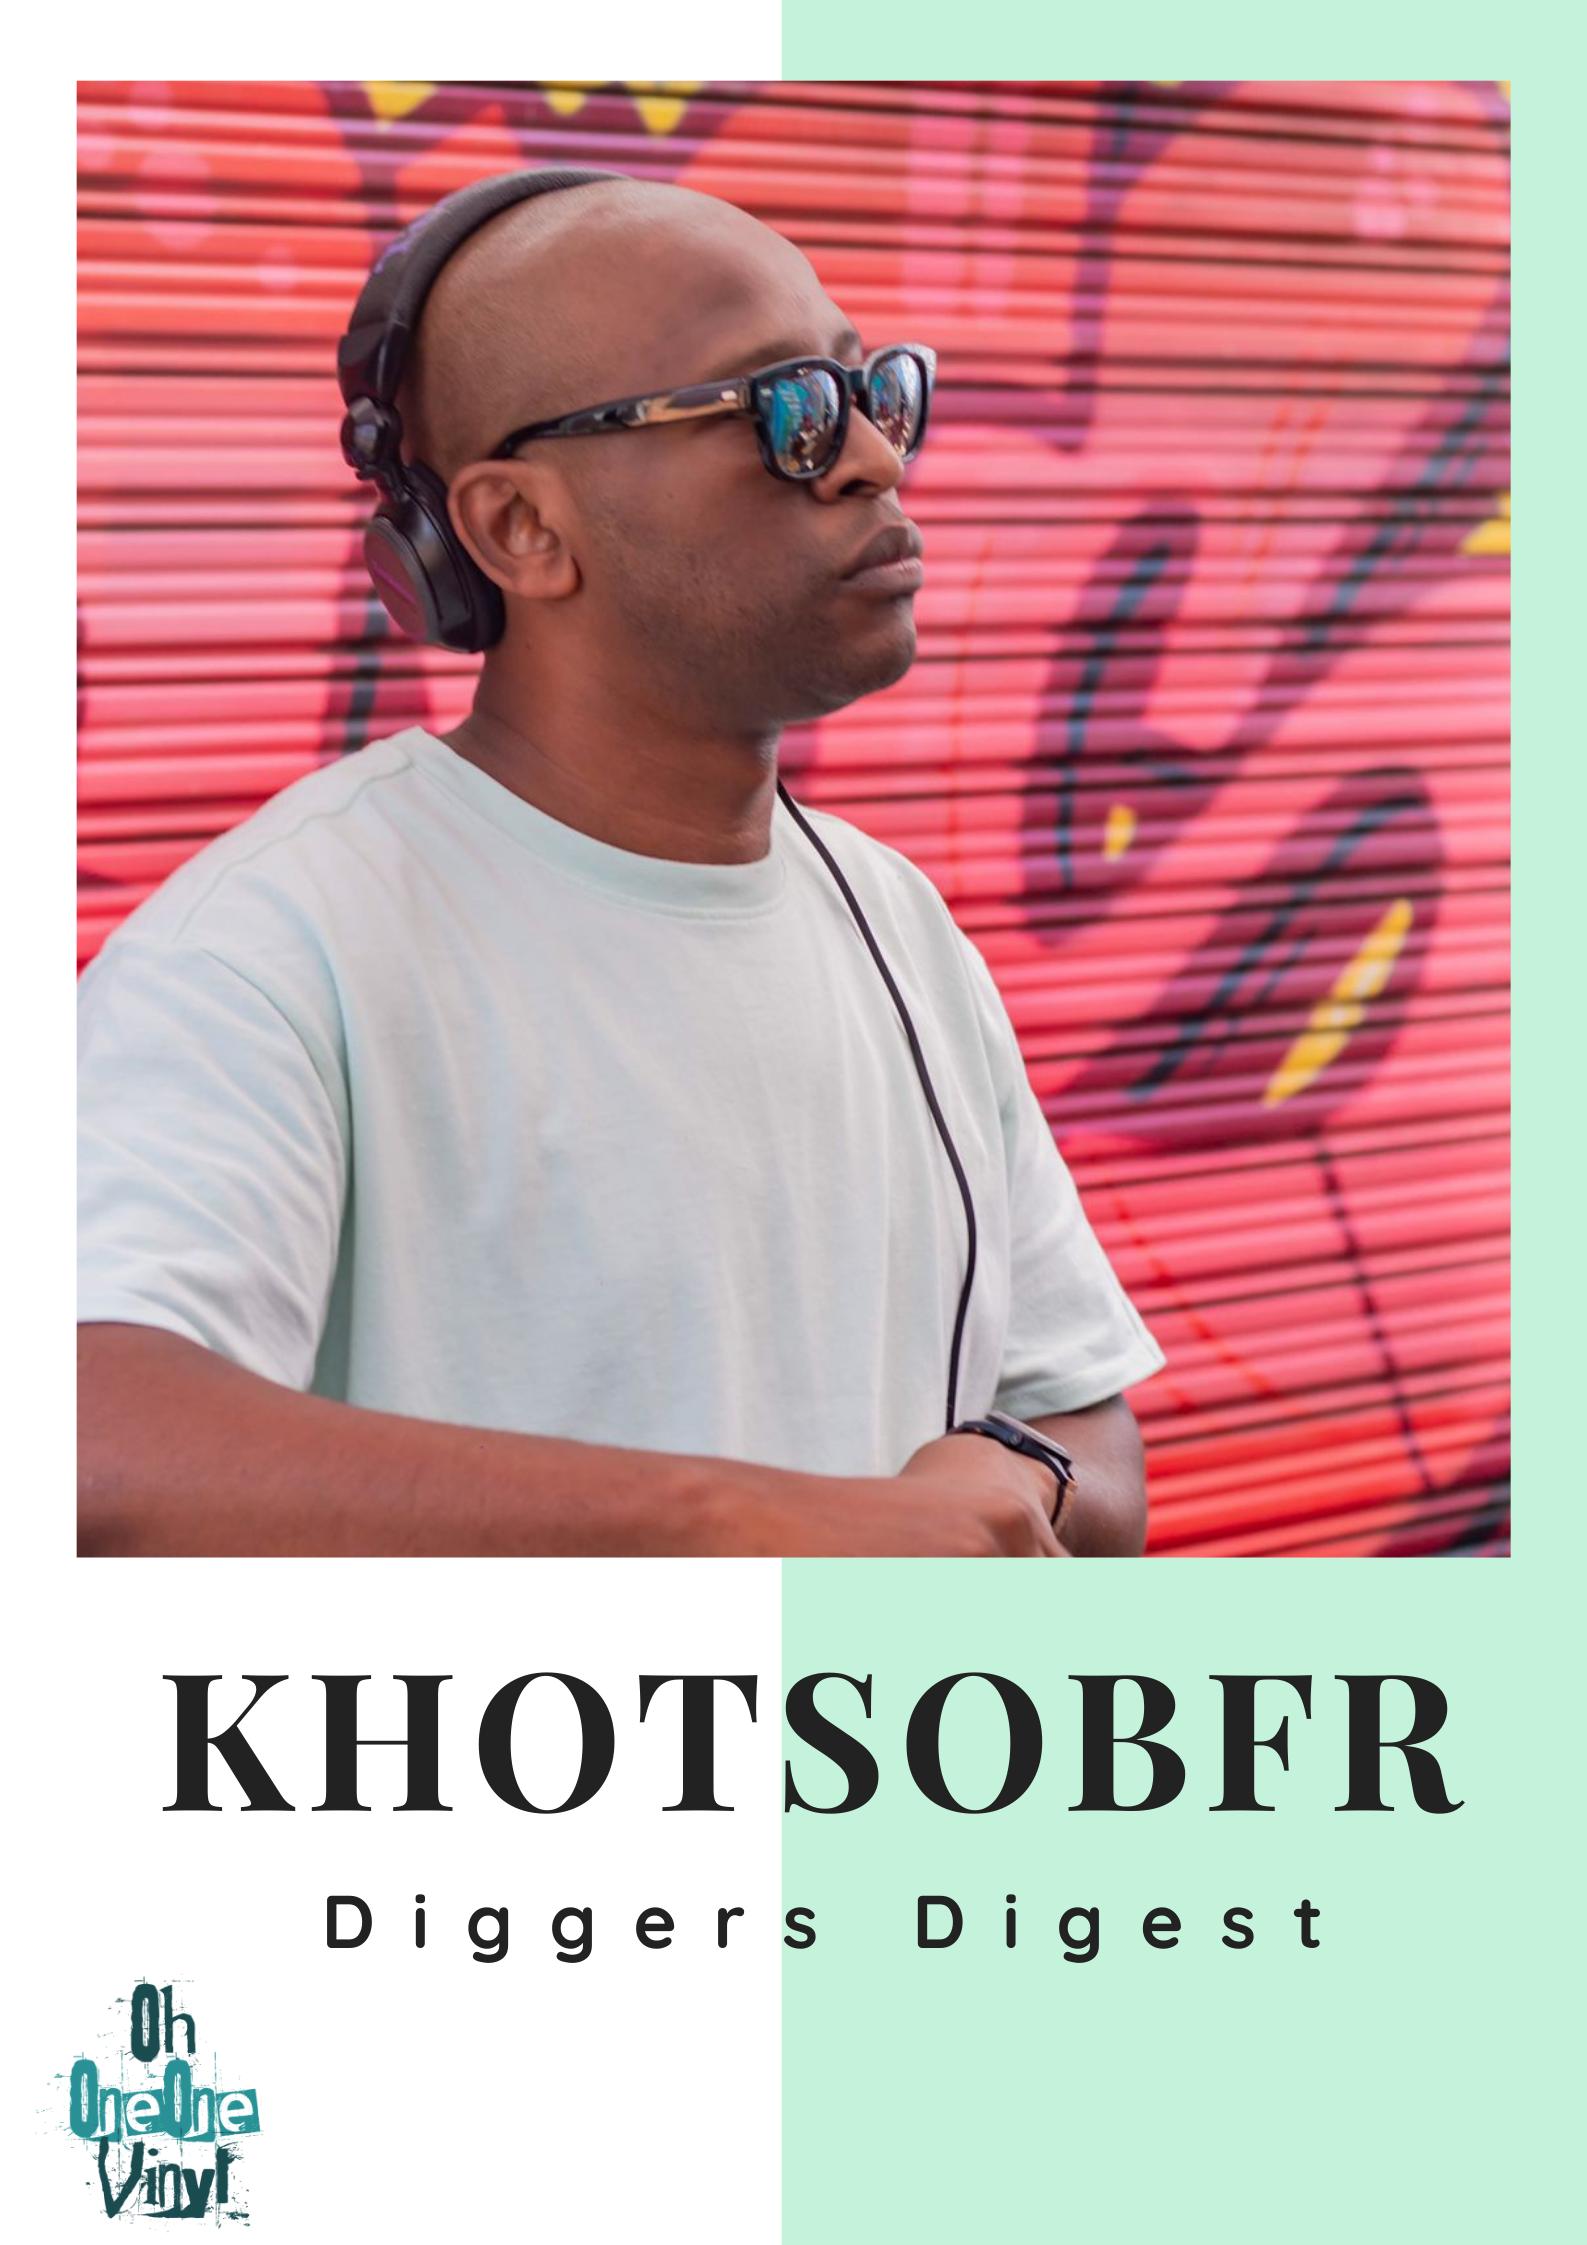 Diggers Digest – KhotsoBFR